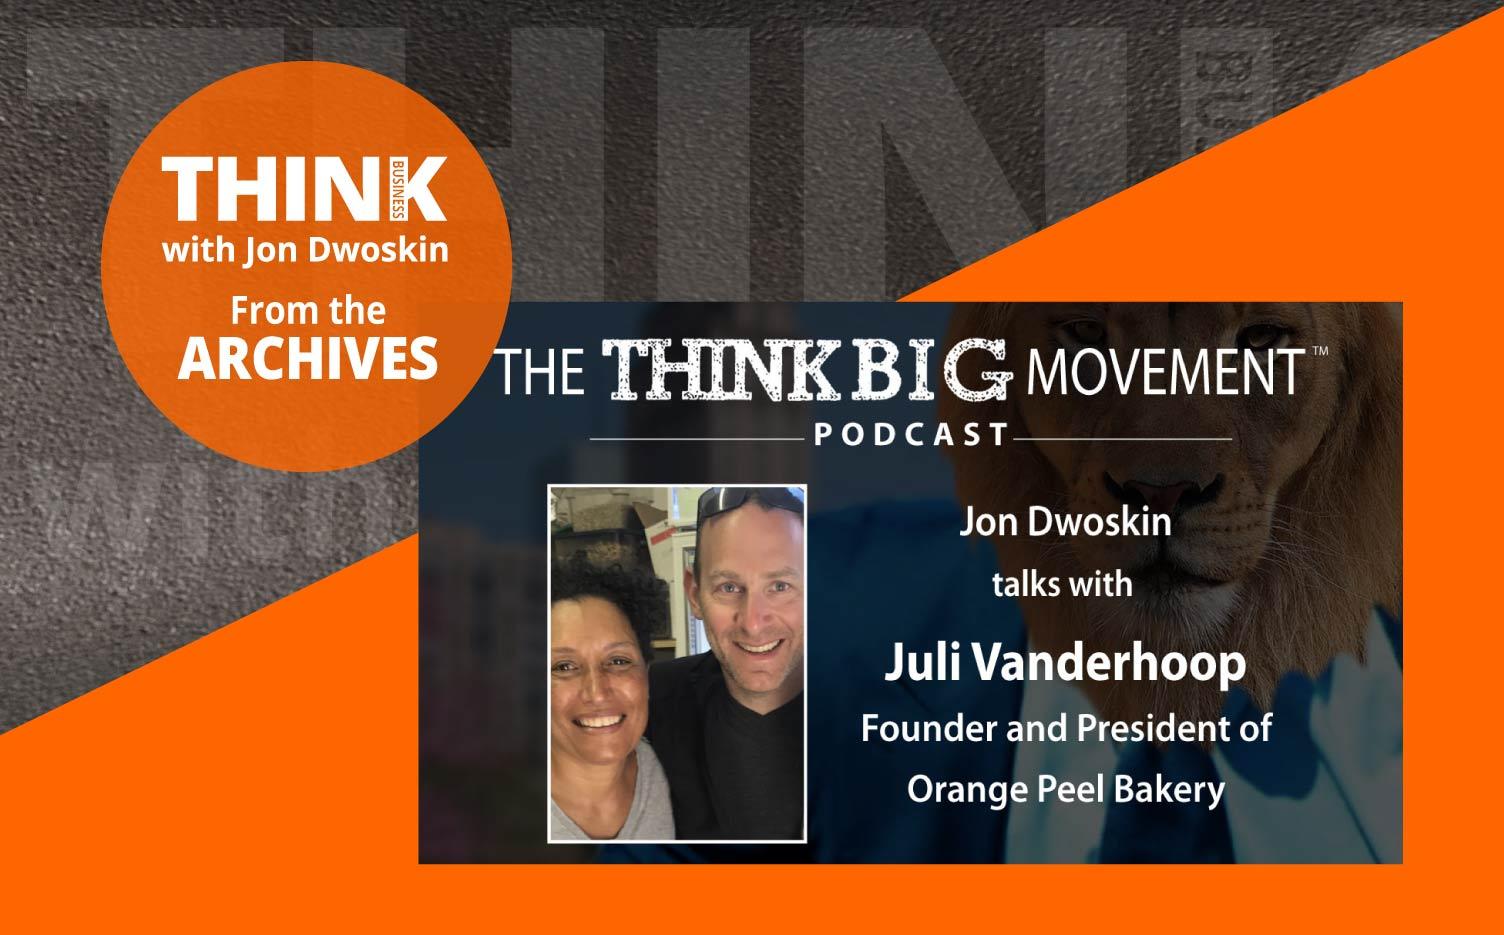 THINK Business Podcast: Jon Dwoskin Interviews Juli Vanderhoop Founder and President of Orange Peel Bakery